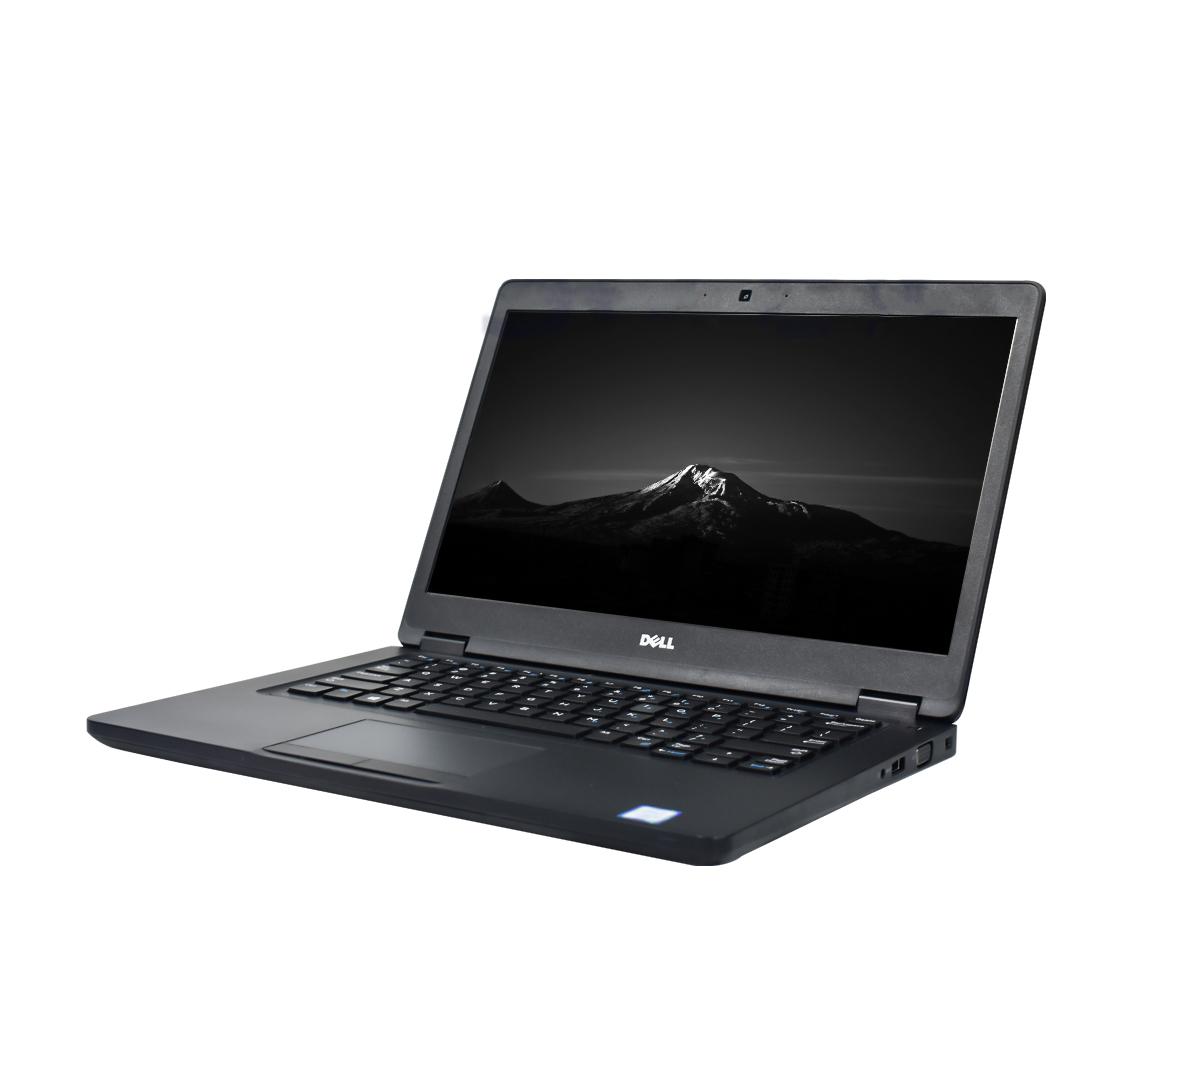 Dell Latitude 5480 Business Laptop, Intel Core i5-6200U CPU, 8GB DDR4 SODIMM RAM, 256GB SSD M2, 14 inch Display, Windows 10 Pro (Refurbished)